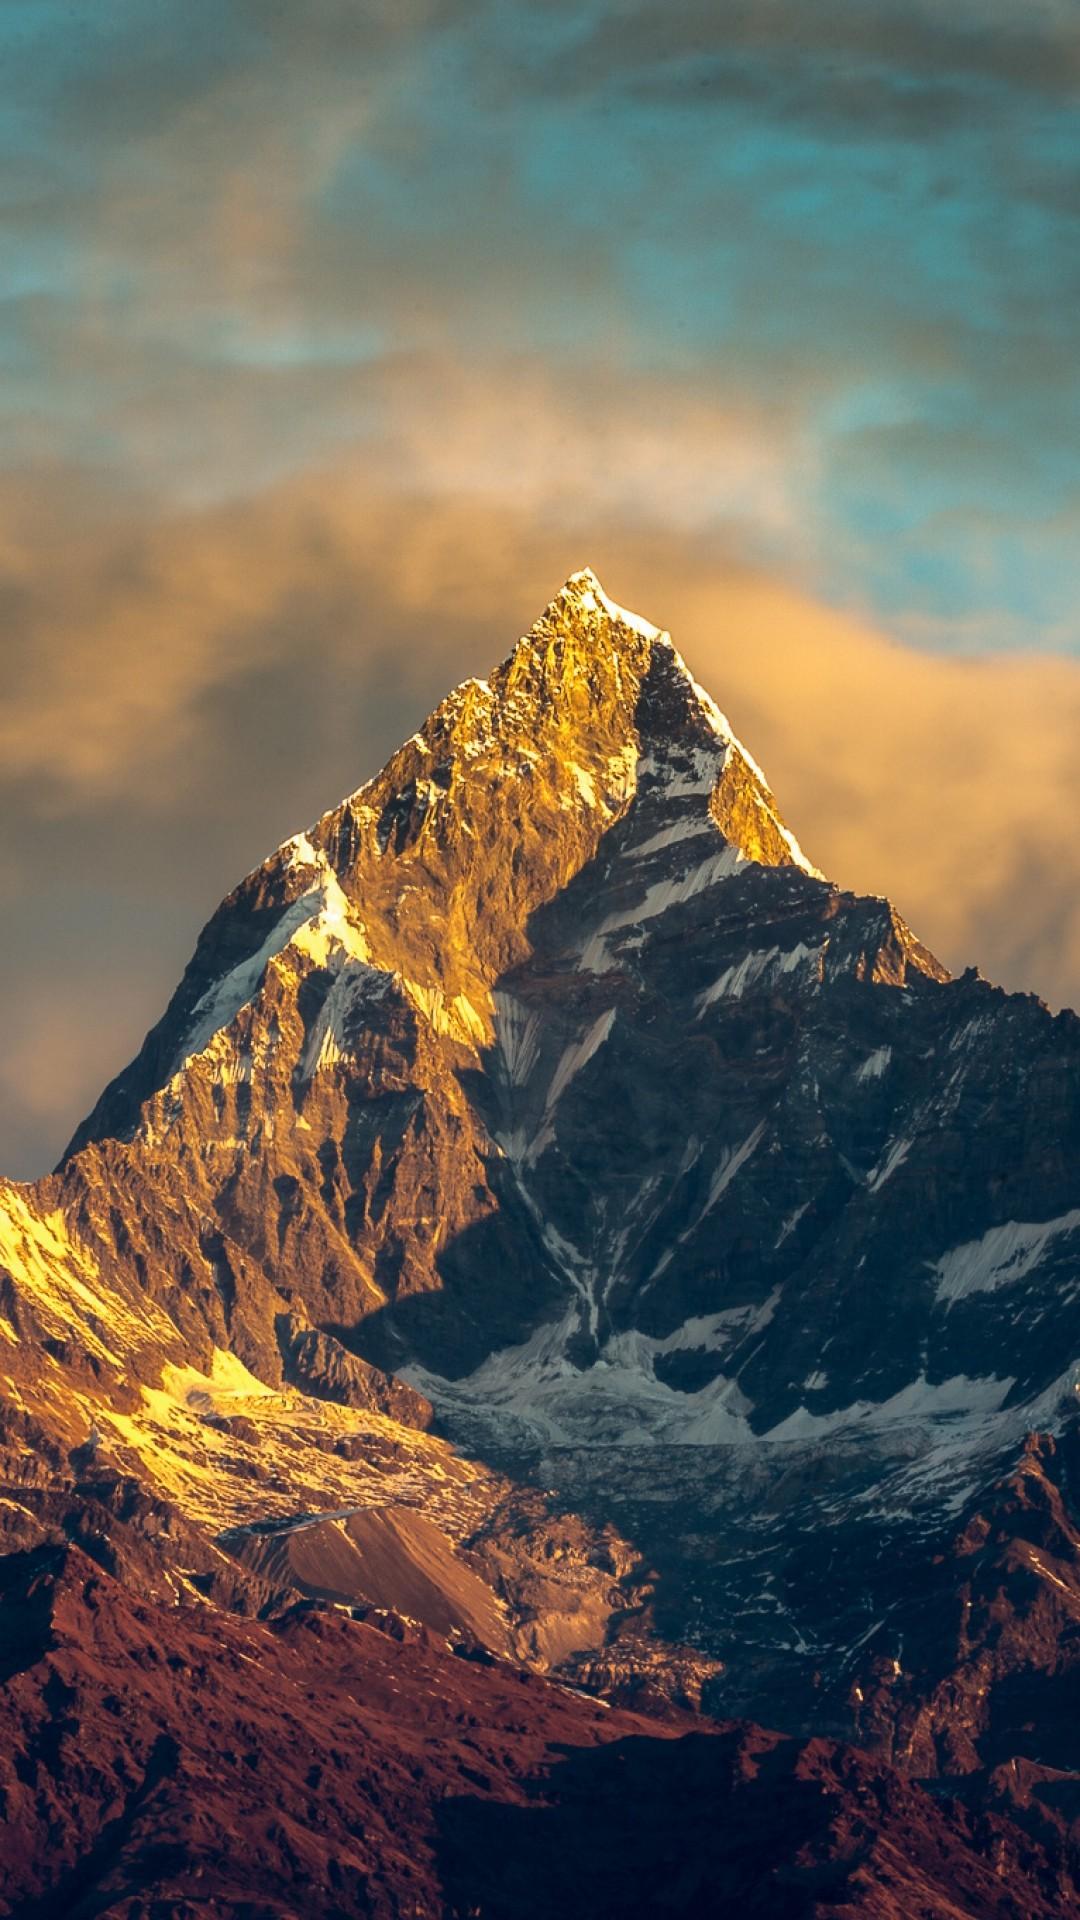 Nepal wallpaper wallpapertag - Himalaya pictures wallpaper ...